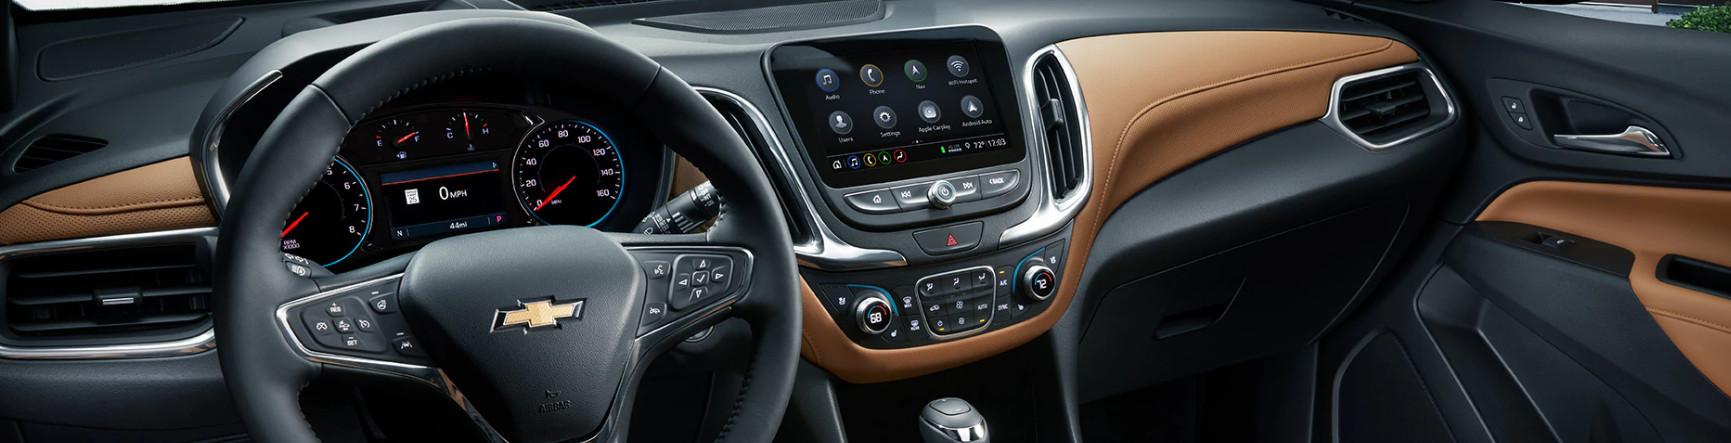 2020 Chevrolet Equinox Front Dashboard